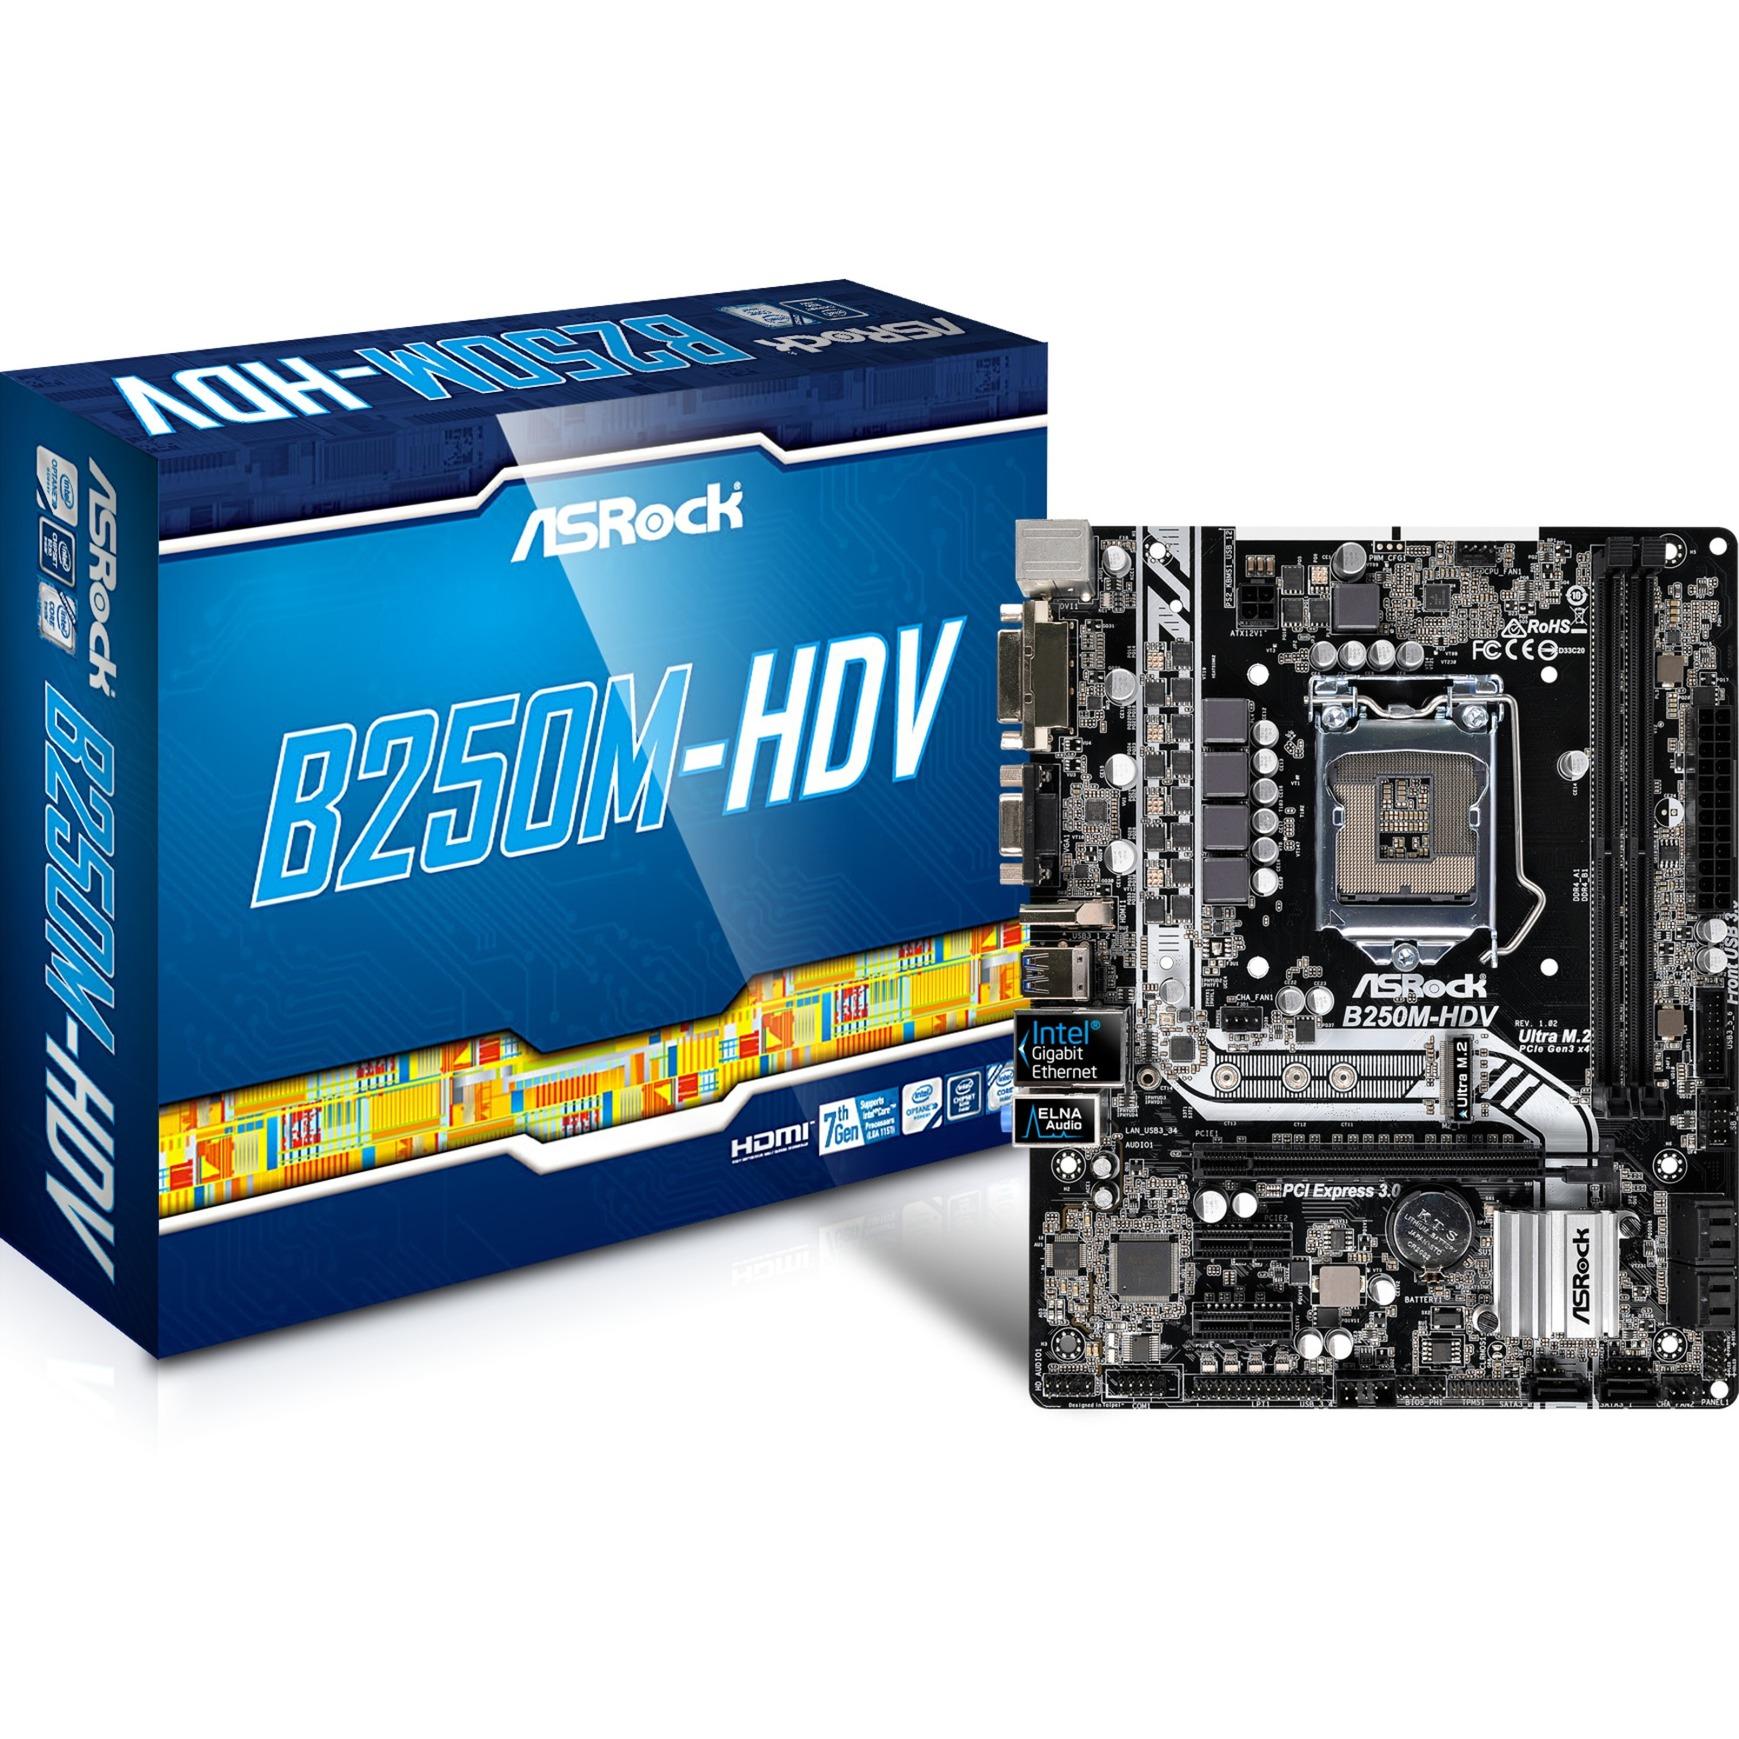 B250M-HDV LGA 1151 (Zócalo H4) Intel B250 micro ATX, Placa base